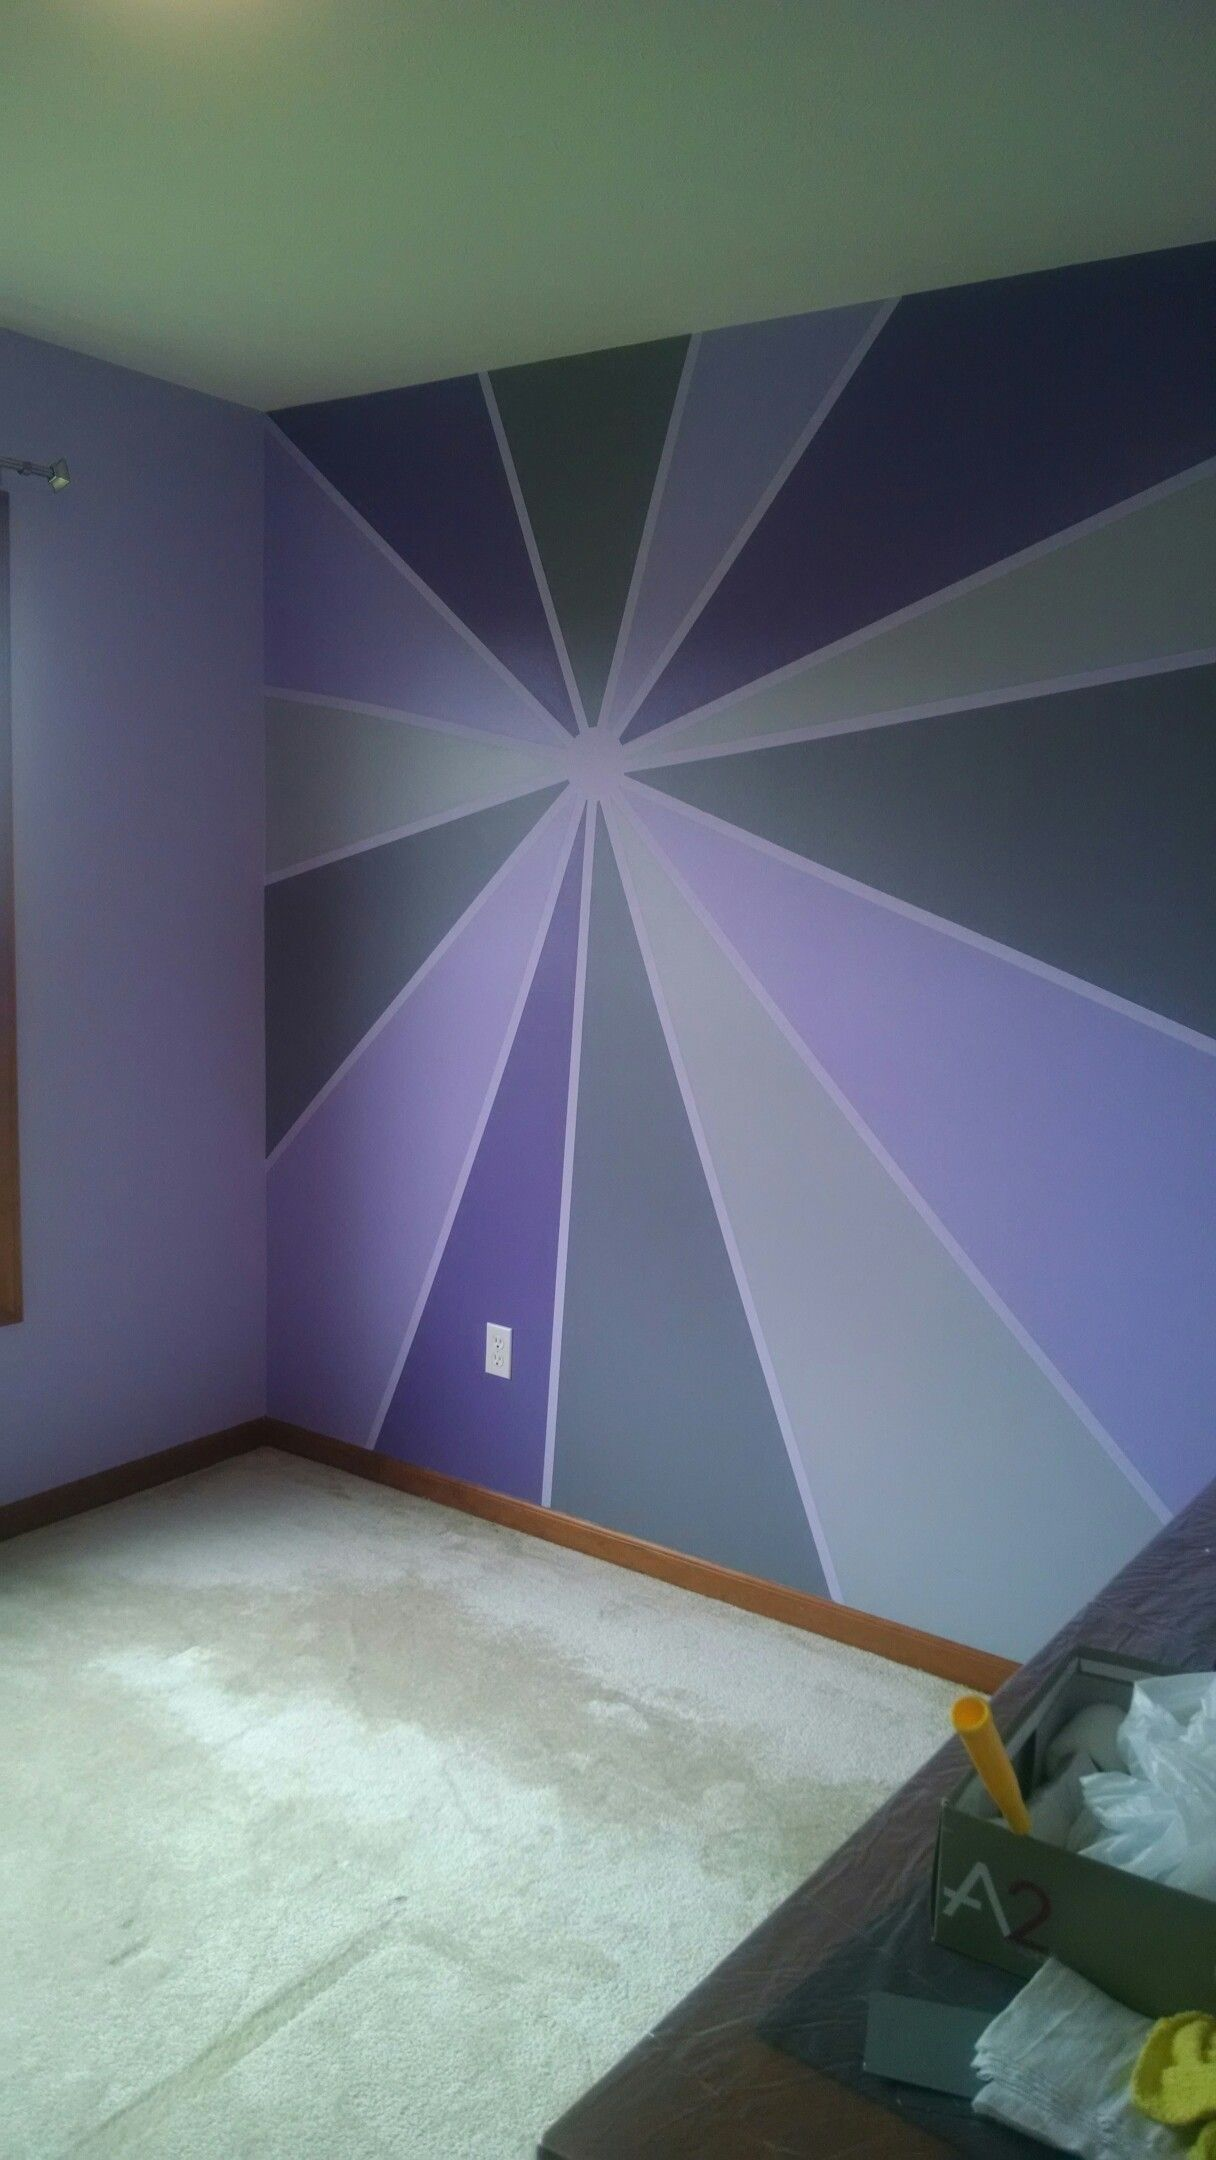 Craft Room Bedroom Wall Paint Wall Decor Design Geometric Wall Paint